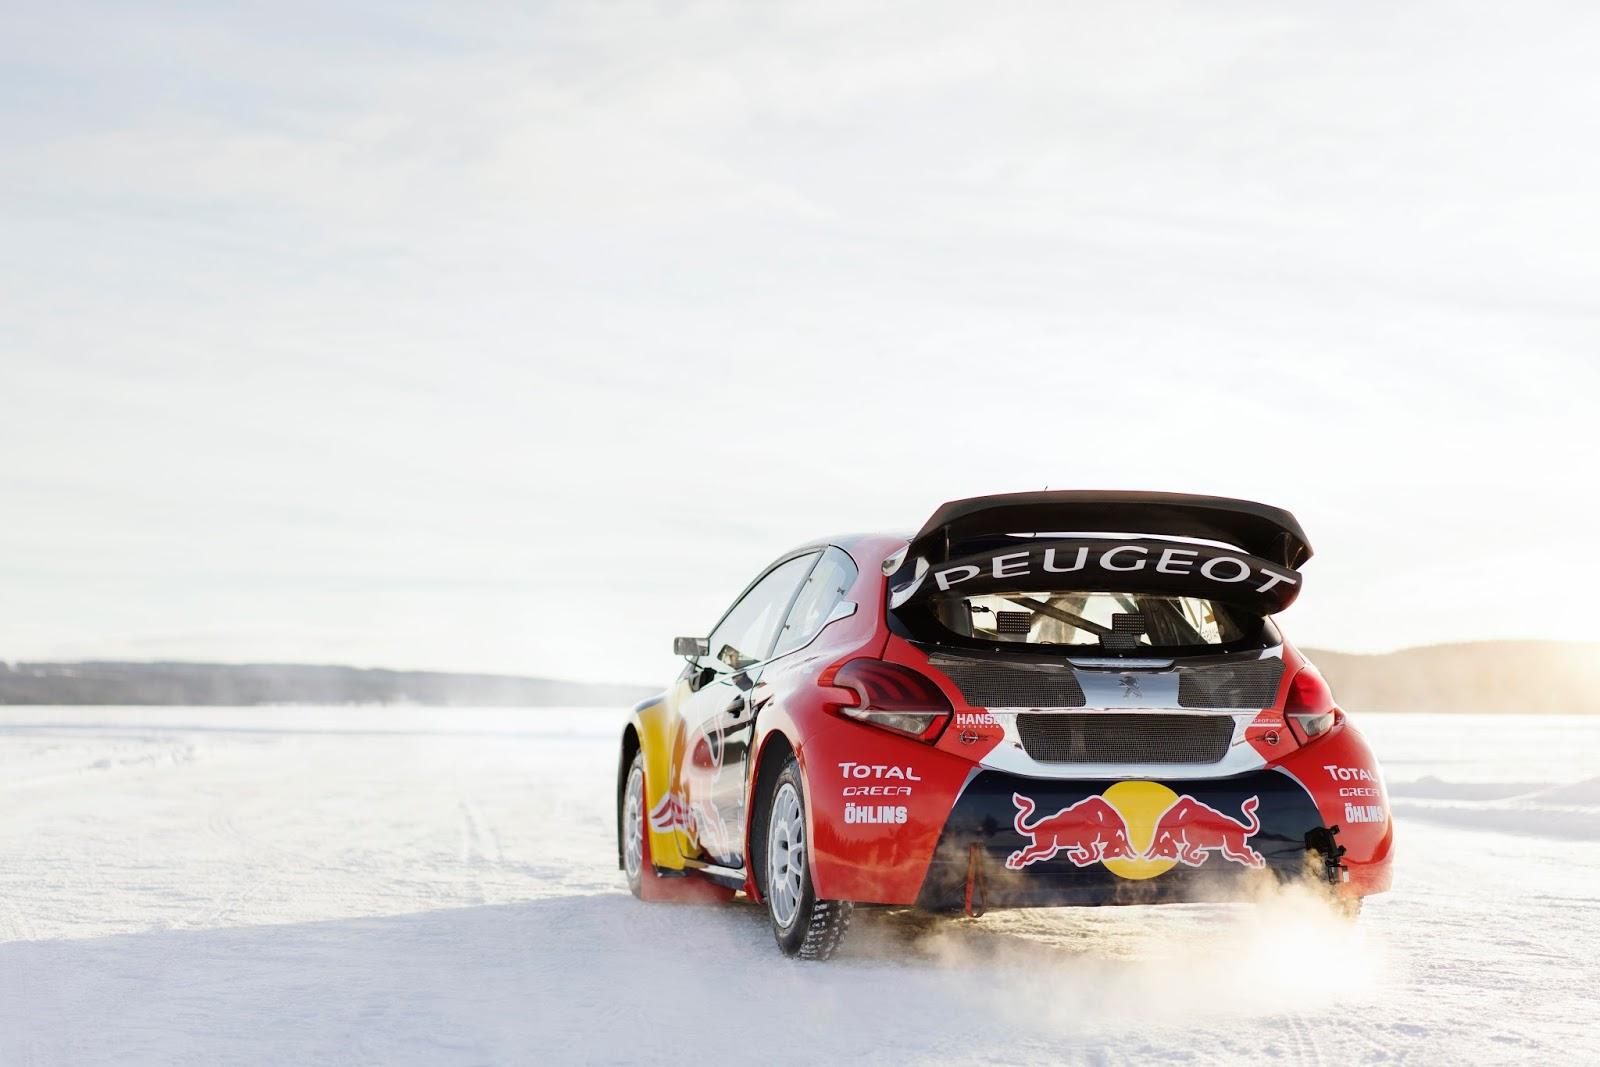 SI201602220599 hires jpeg 24bit rgb Ο Sebastien Loeb θα συμμετέχει σε όλο το φετινό πρωτάθλημα Rallycross! PEUGEOT 208 WRΧ, Peugeot Sport, Rally, Rallycross, Sebastien Loeb, Timmy Hansen, videos, World RX, WRC, zblog